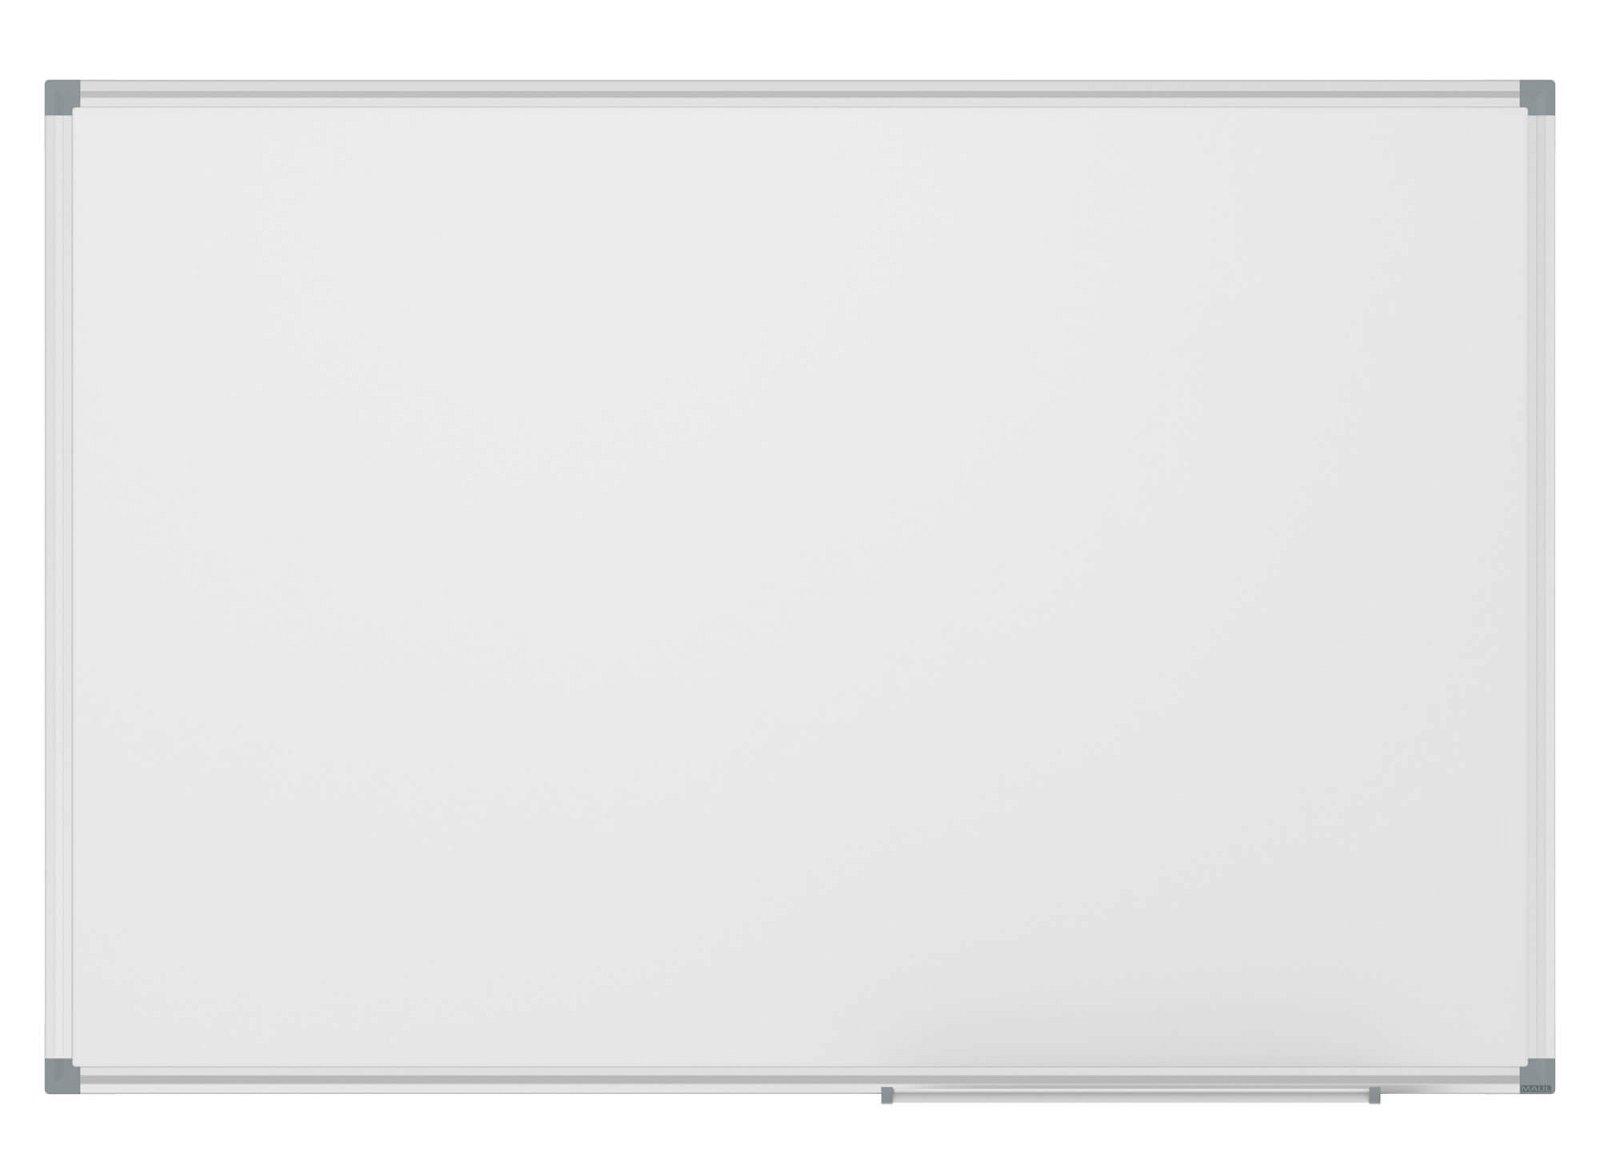 Whiteboard MAULstandard